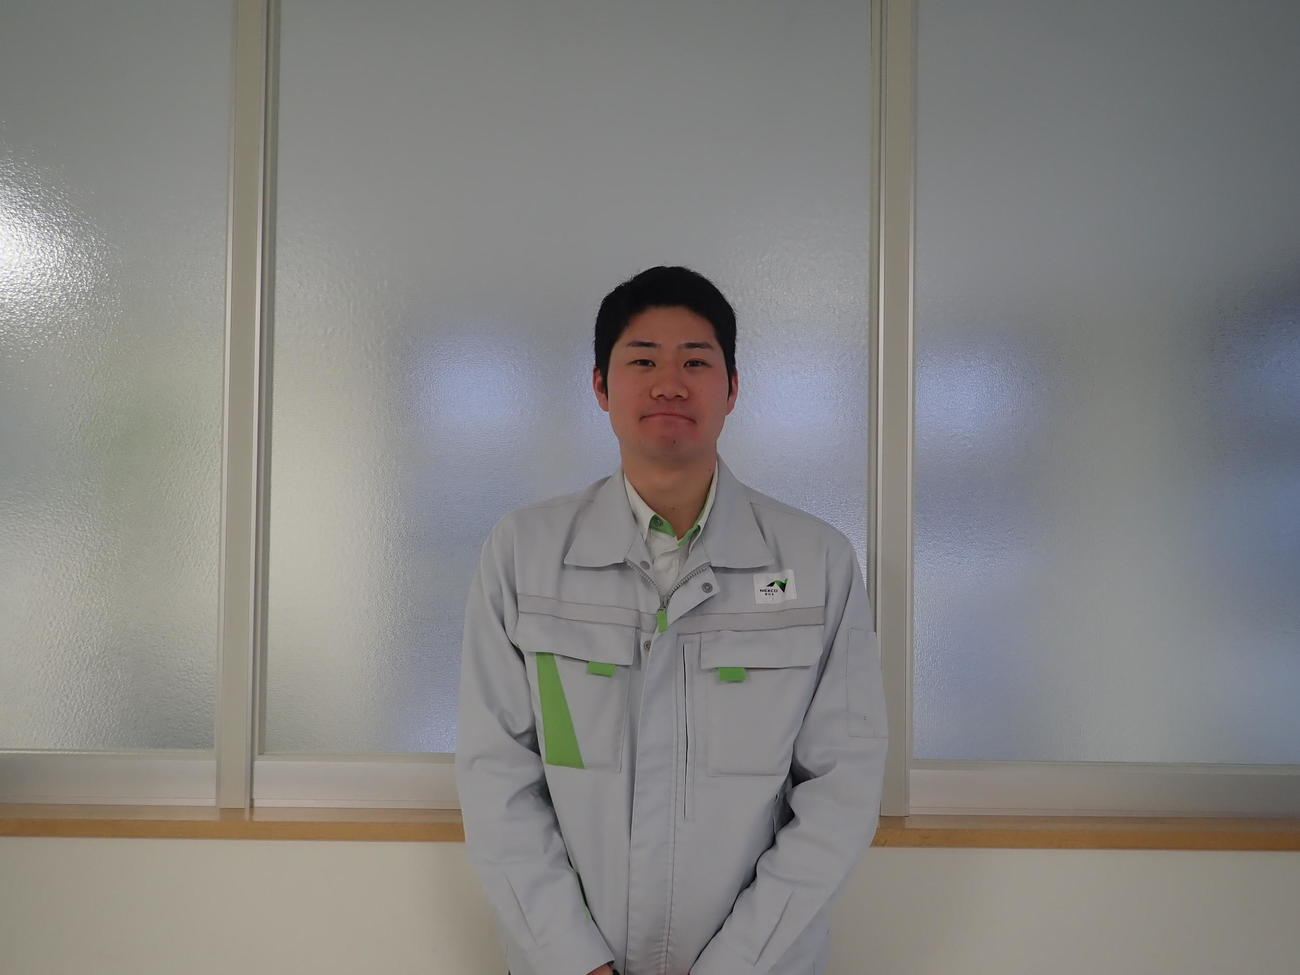 NEXCO東日本北海道支社室蘭管理事務所に勤める東北大OBの鳩原さん(本人提供)